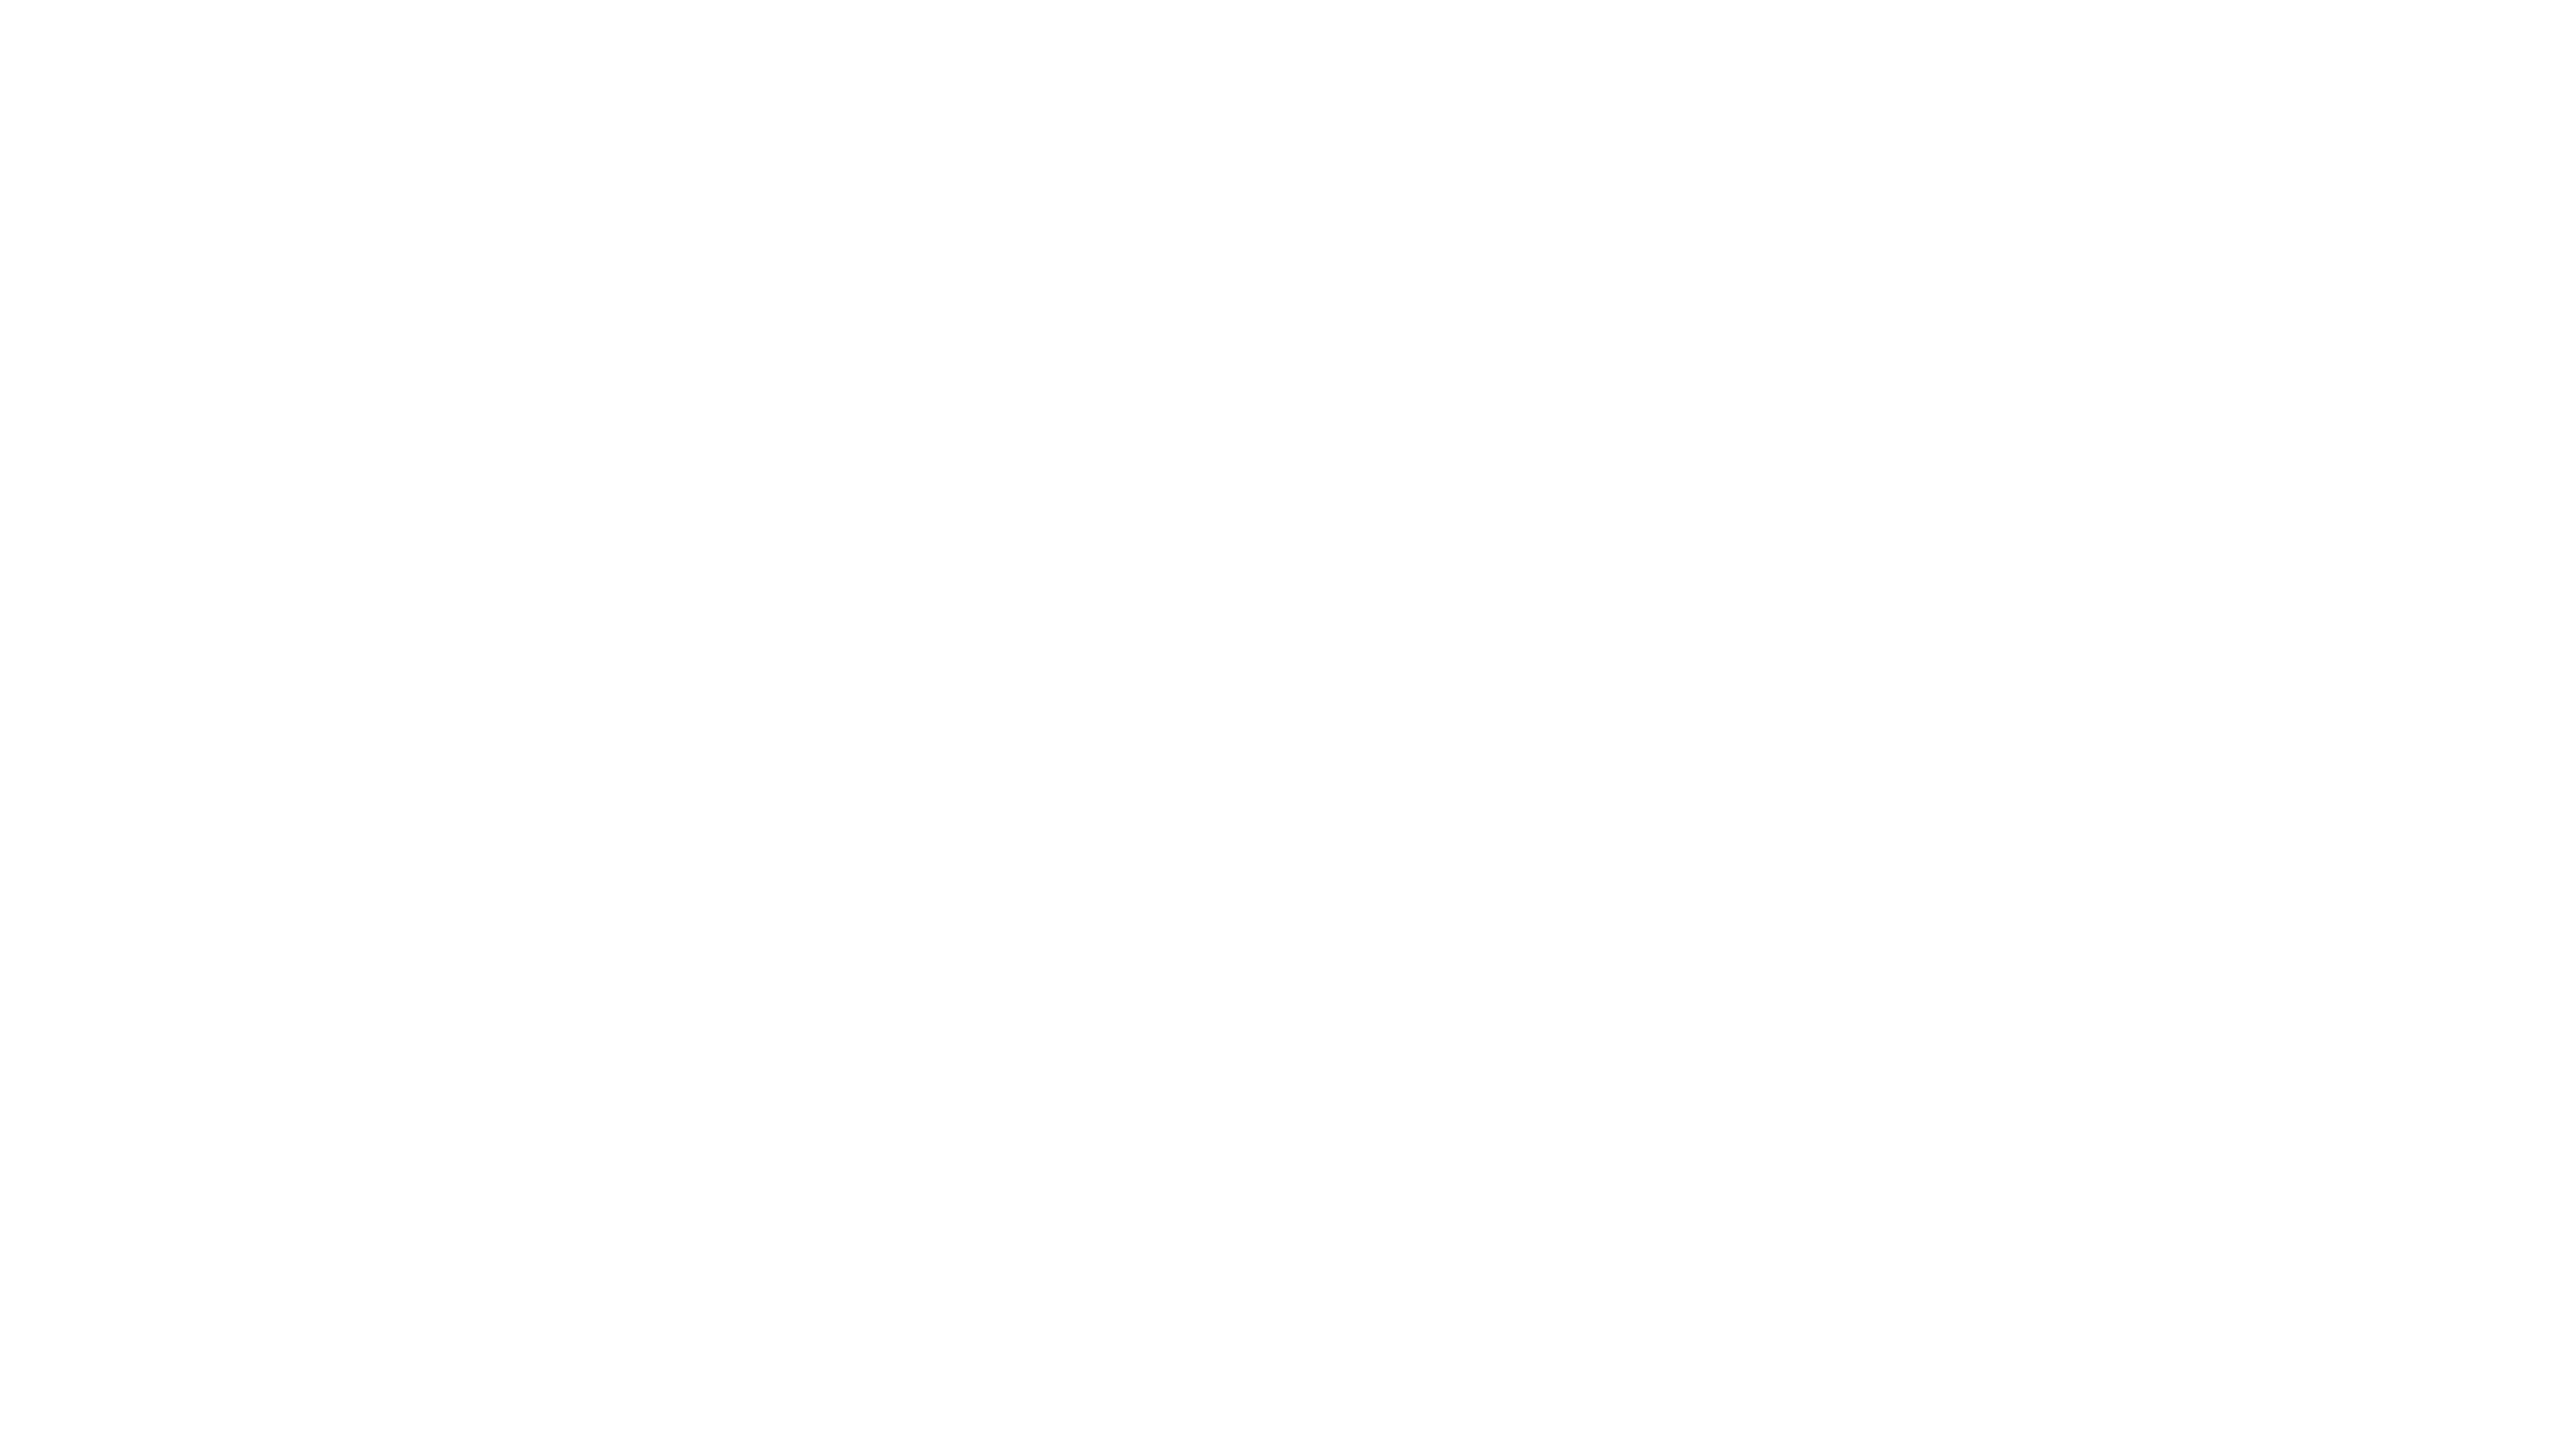 https://pages.dataiku.com/hubfs/Dataiku_logo_White-2.png